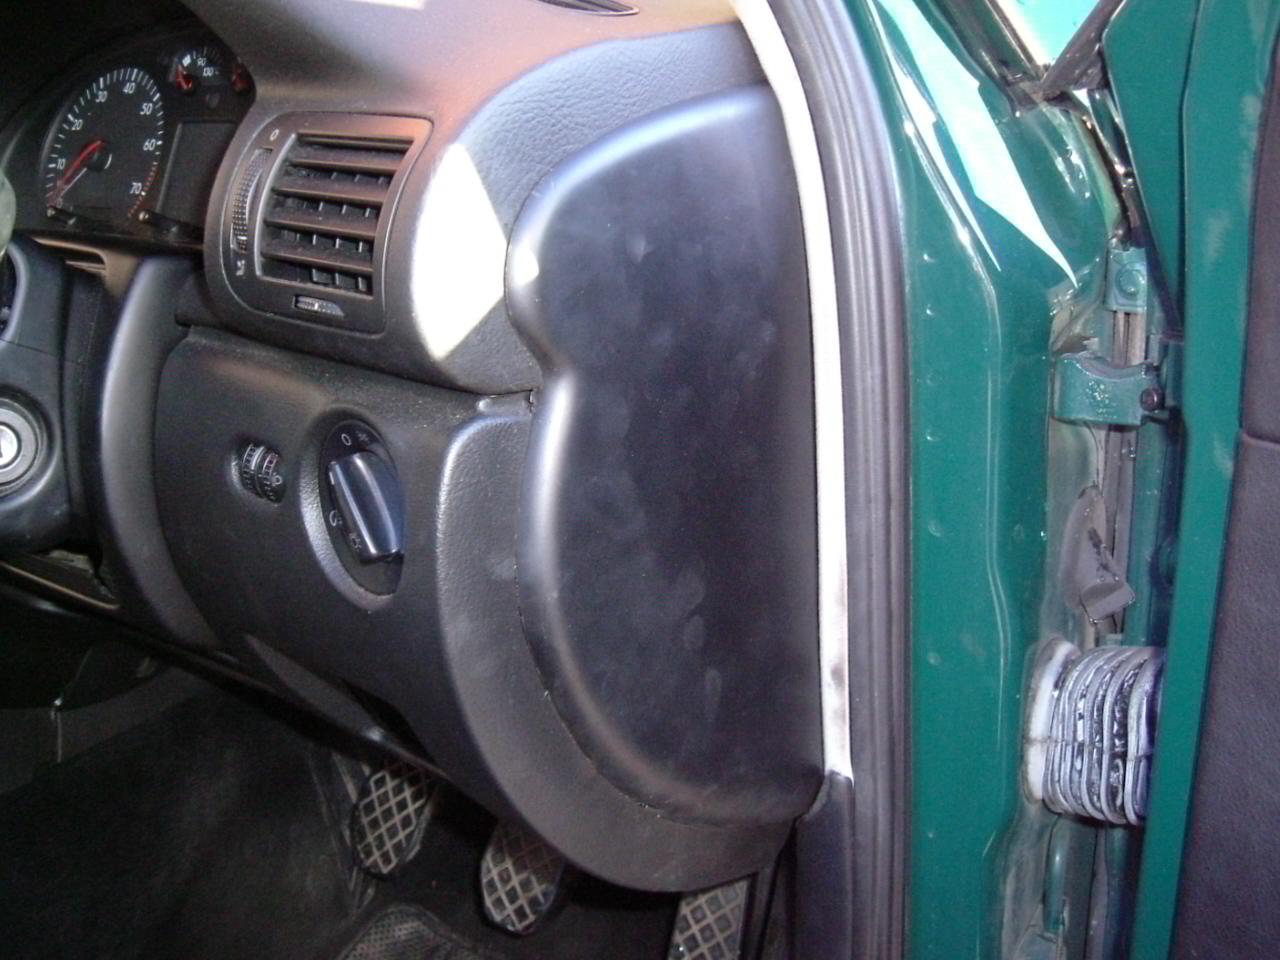 wrg 9867] 2002 vw passat fuse box Volkswagen Passat Dash Volkswagen Passat Fuse Box Location #17